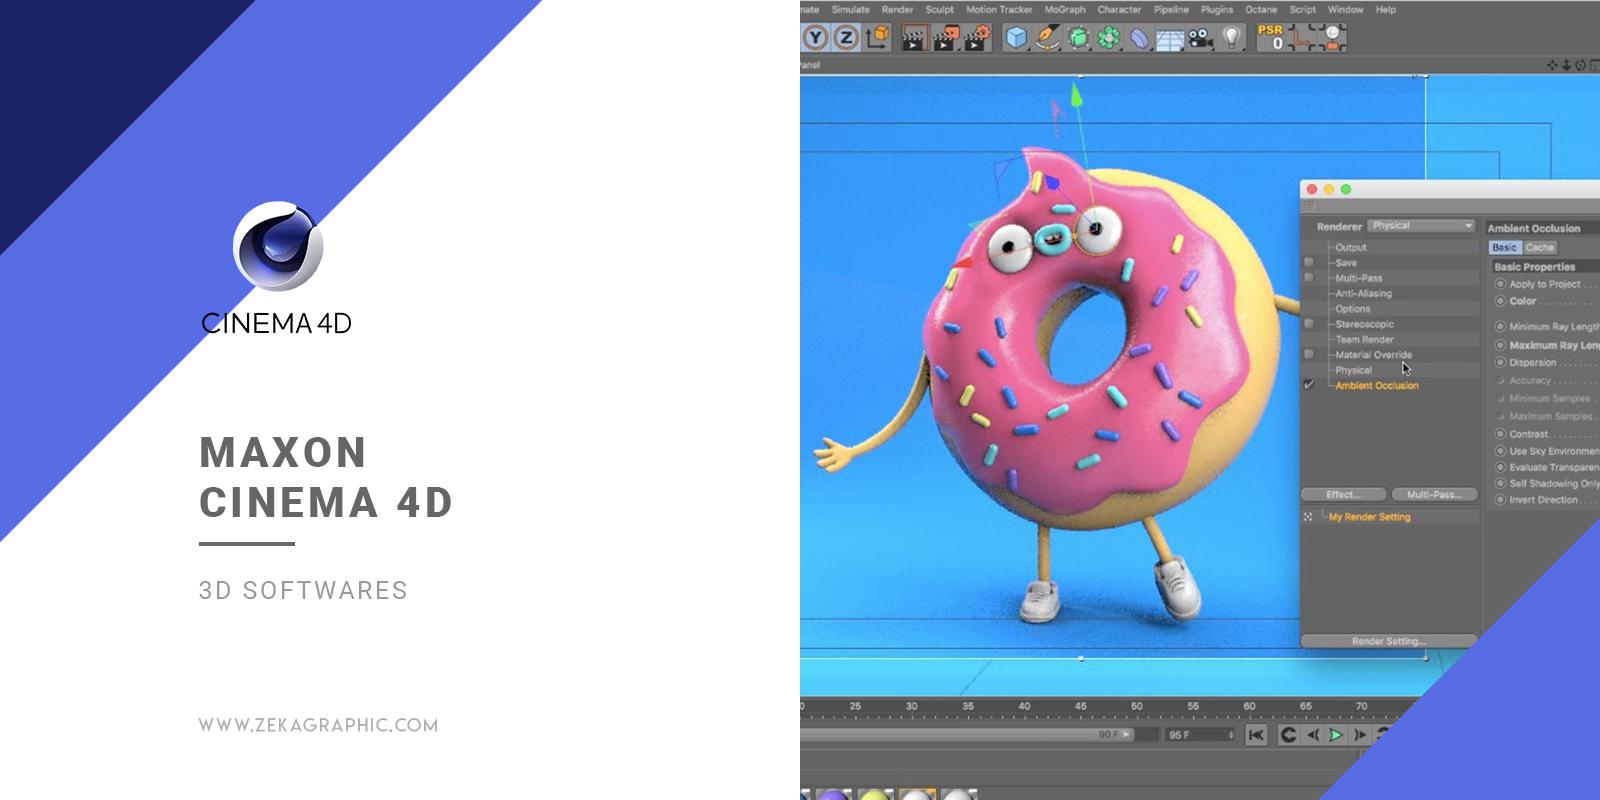 Cinema 4D 3D Software for Graphic Design